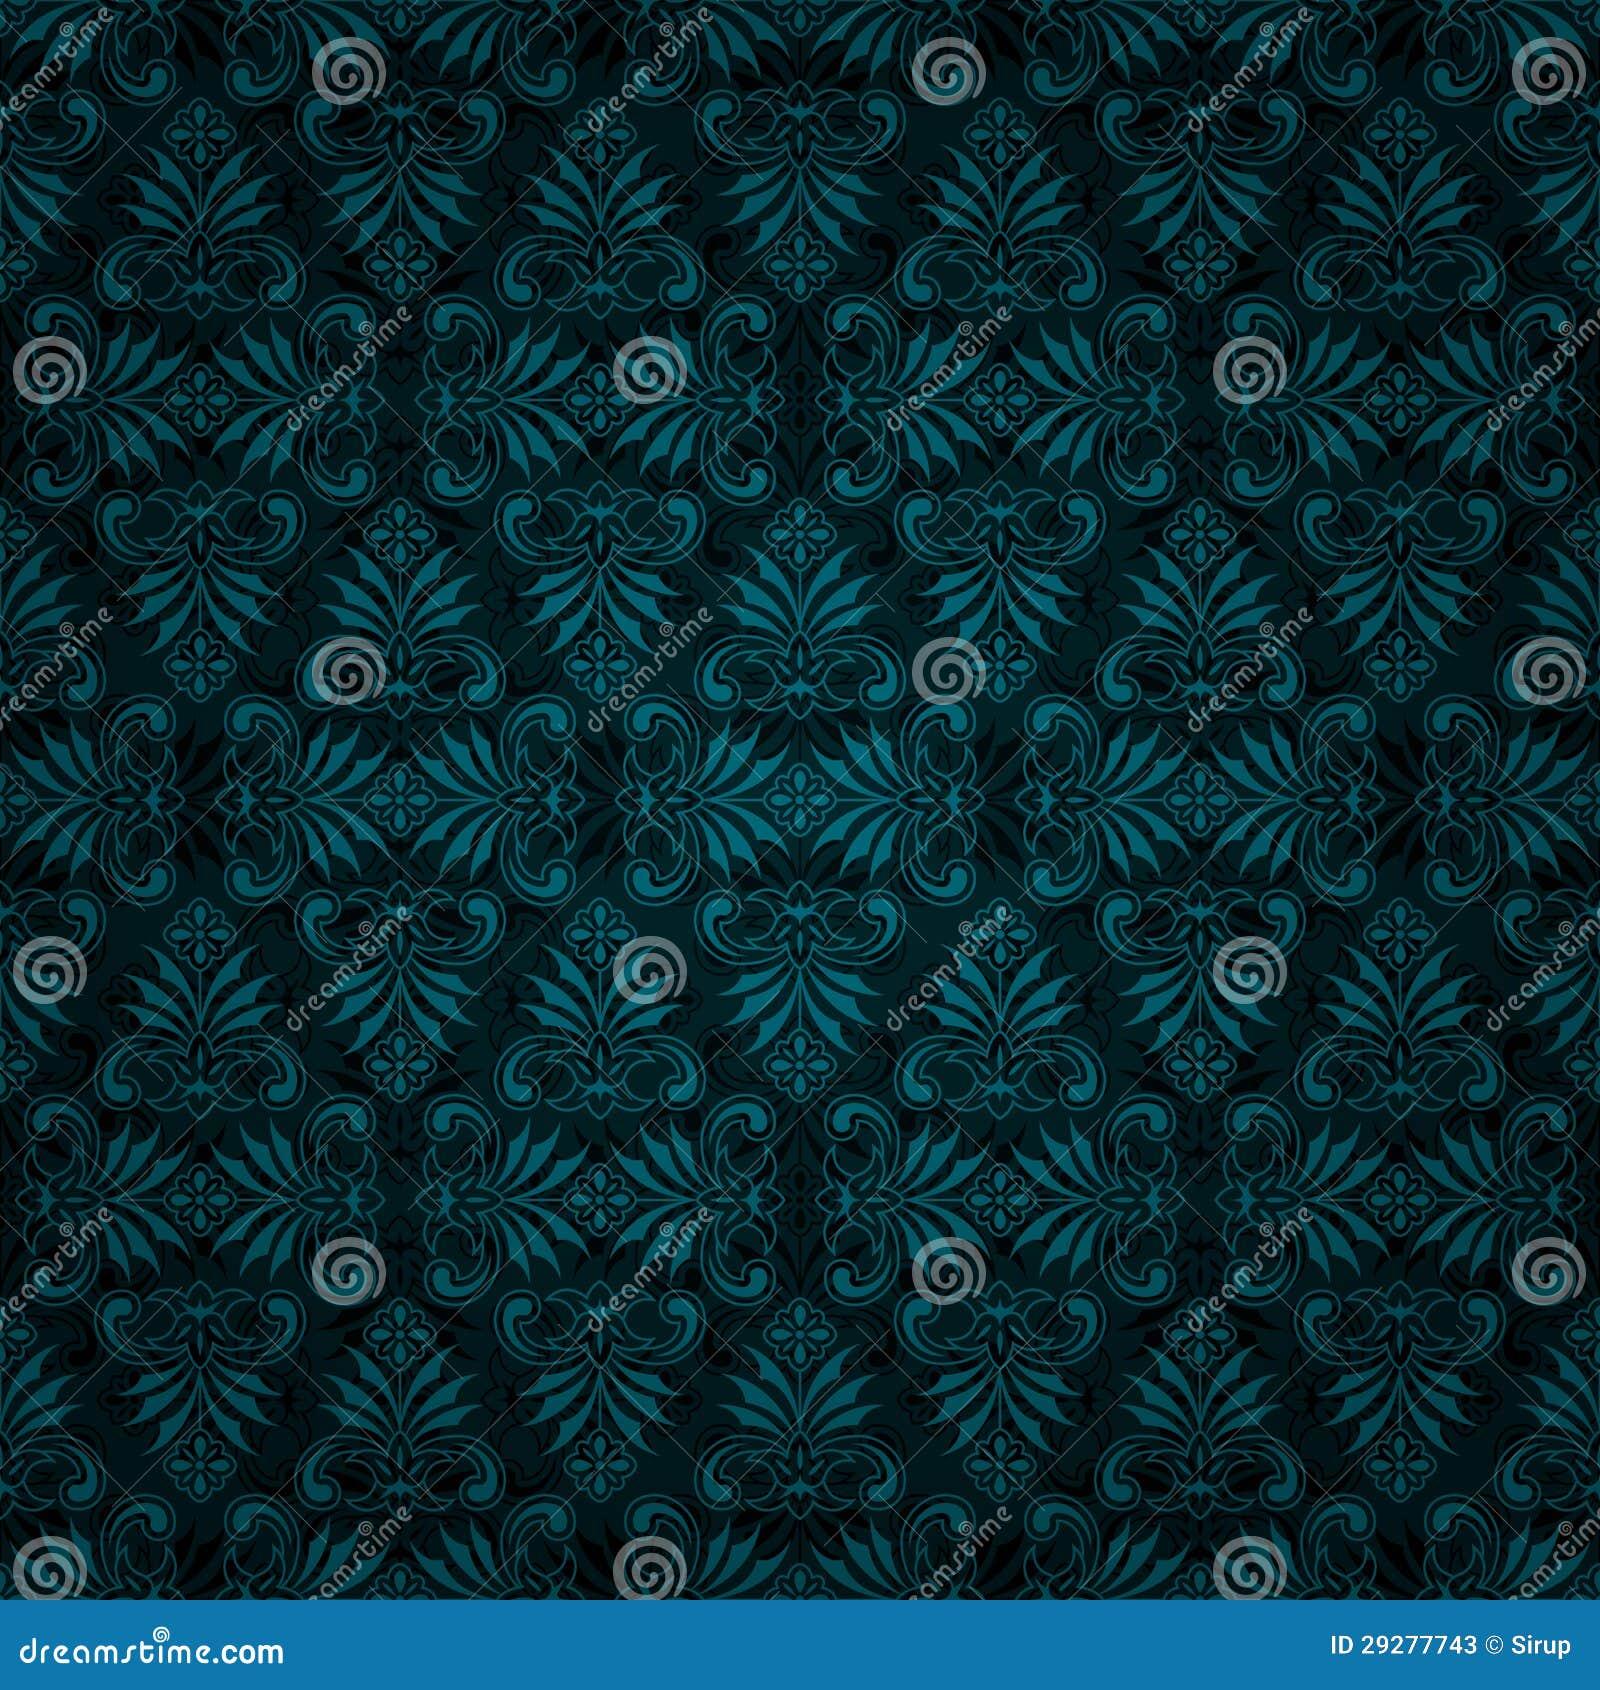 Blue Vintage Wallpaper Designs | www.galleryhip.com - The Hippest Pics